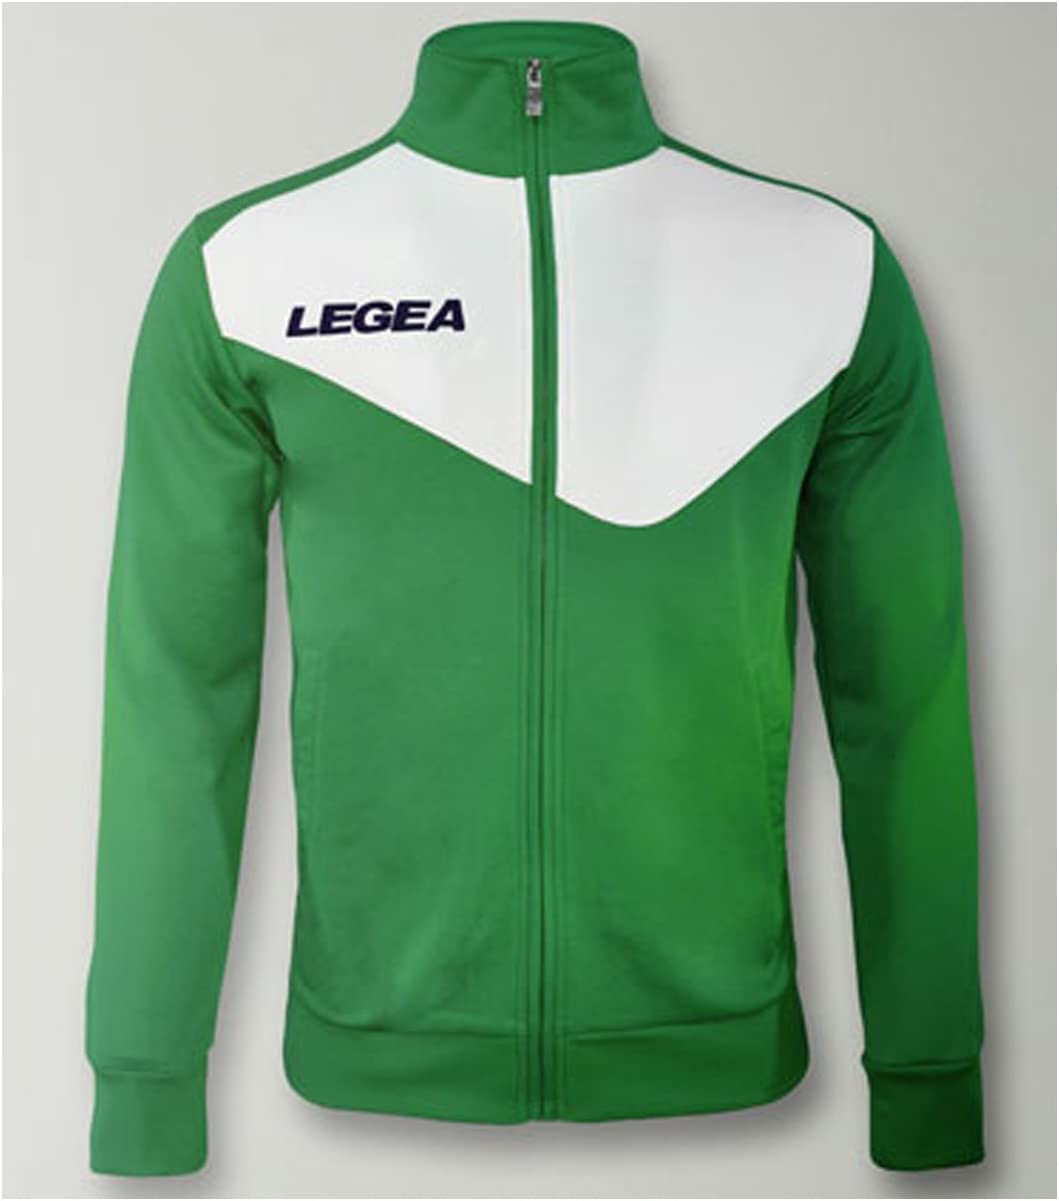 LEGEA Mexico Long Sleeve Sports Running Football Jogging Pegashop Jacket